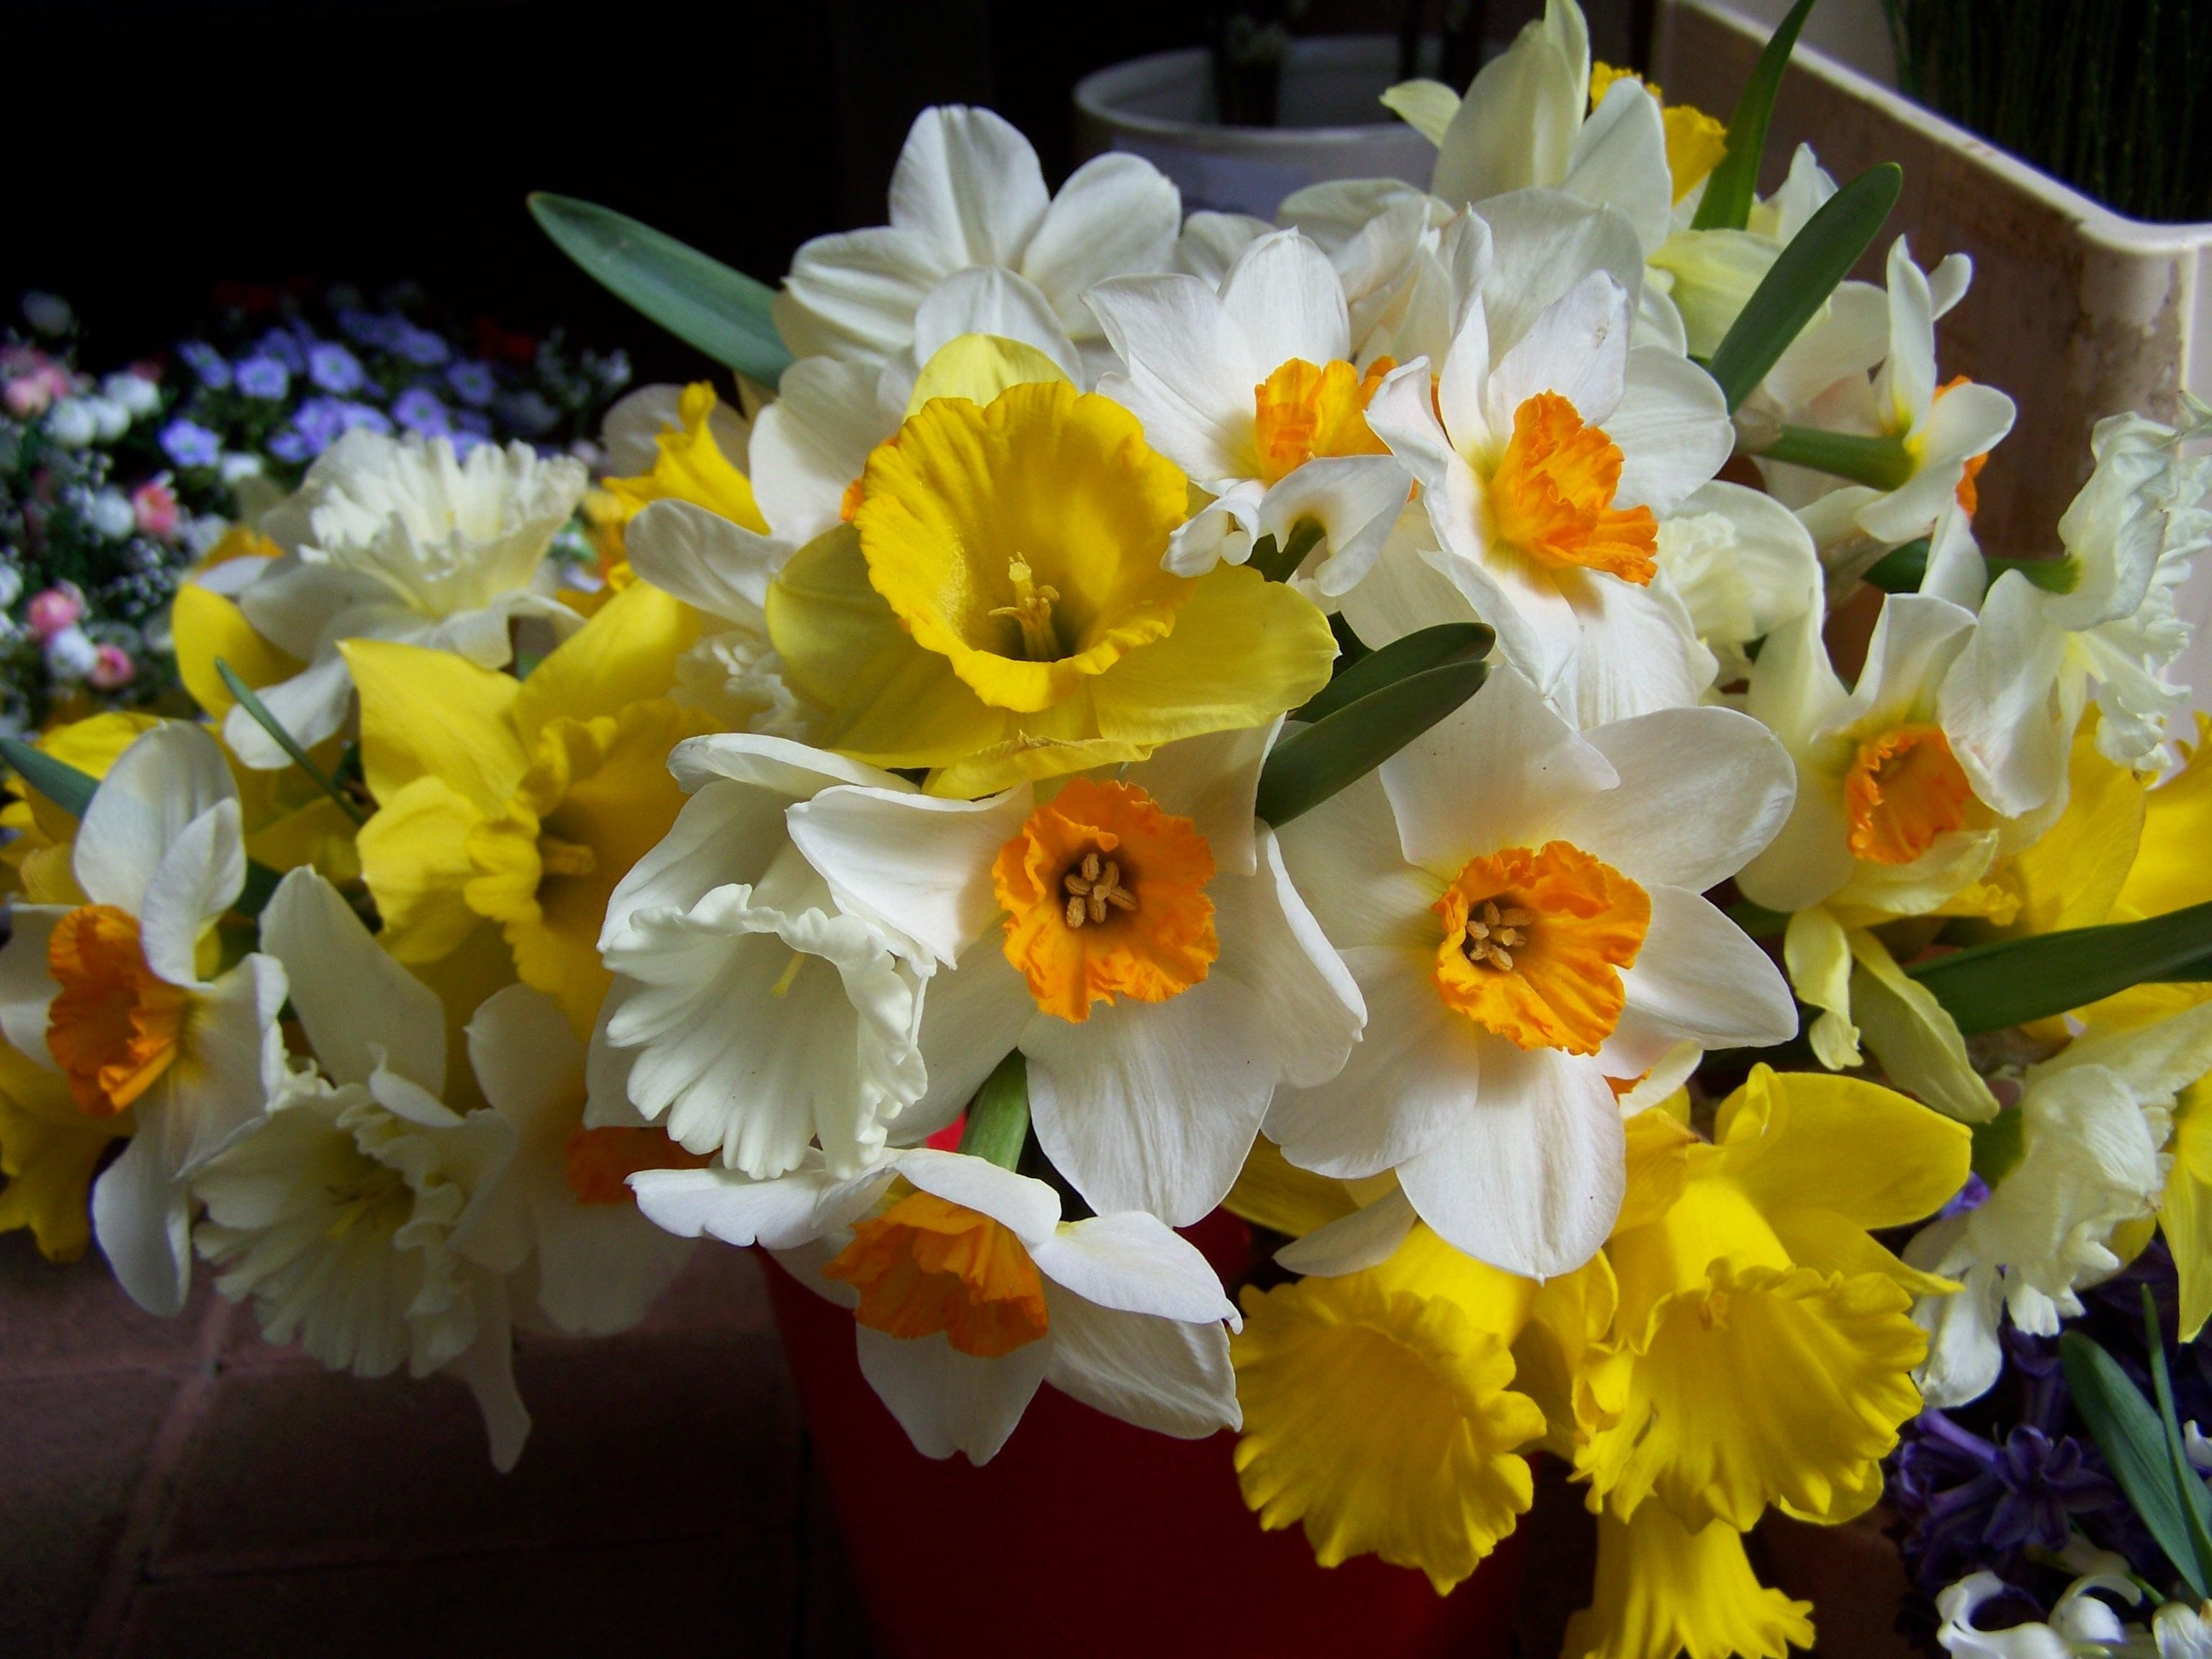 картинки цветы нарциссы букеты каталог, удобная